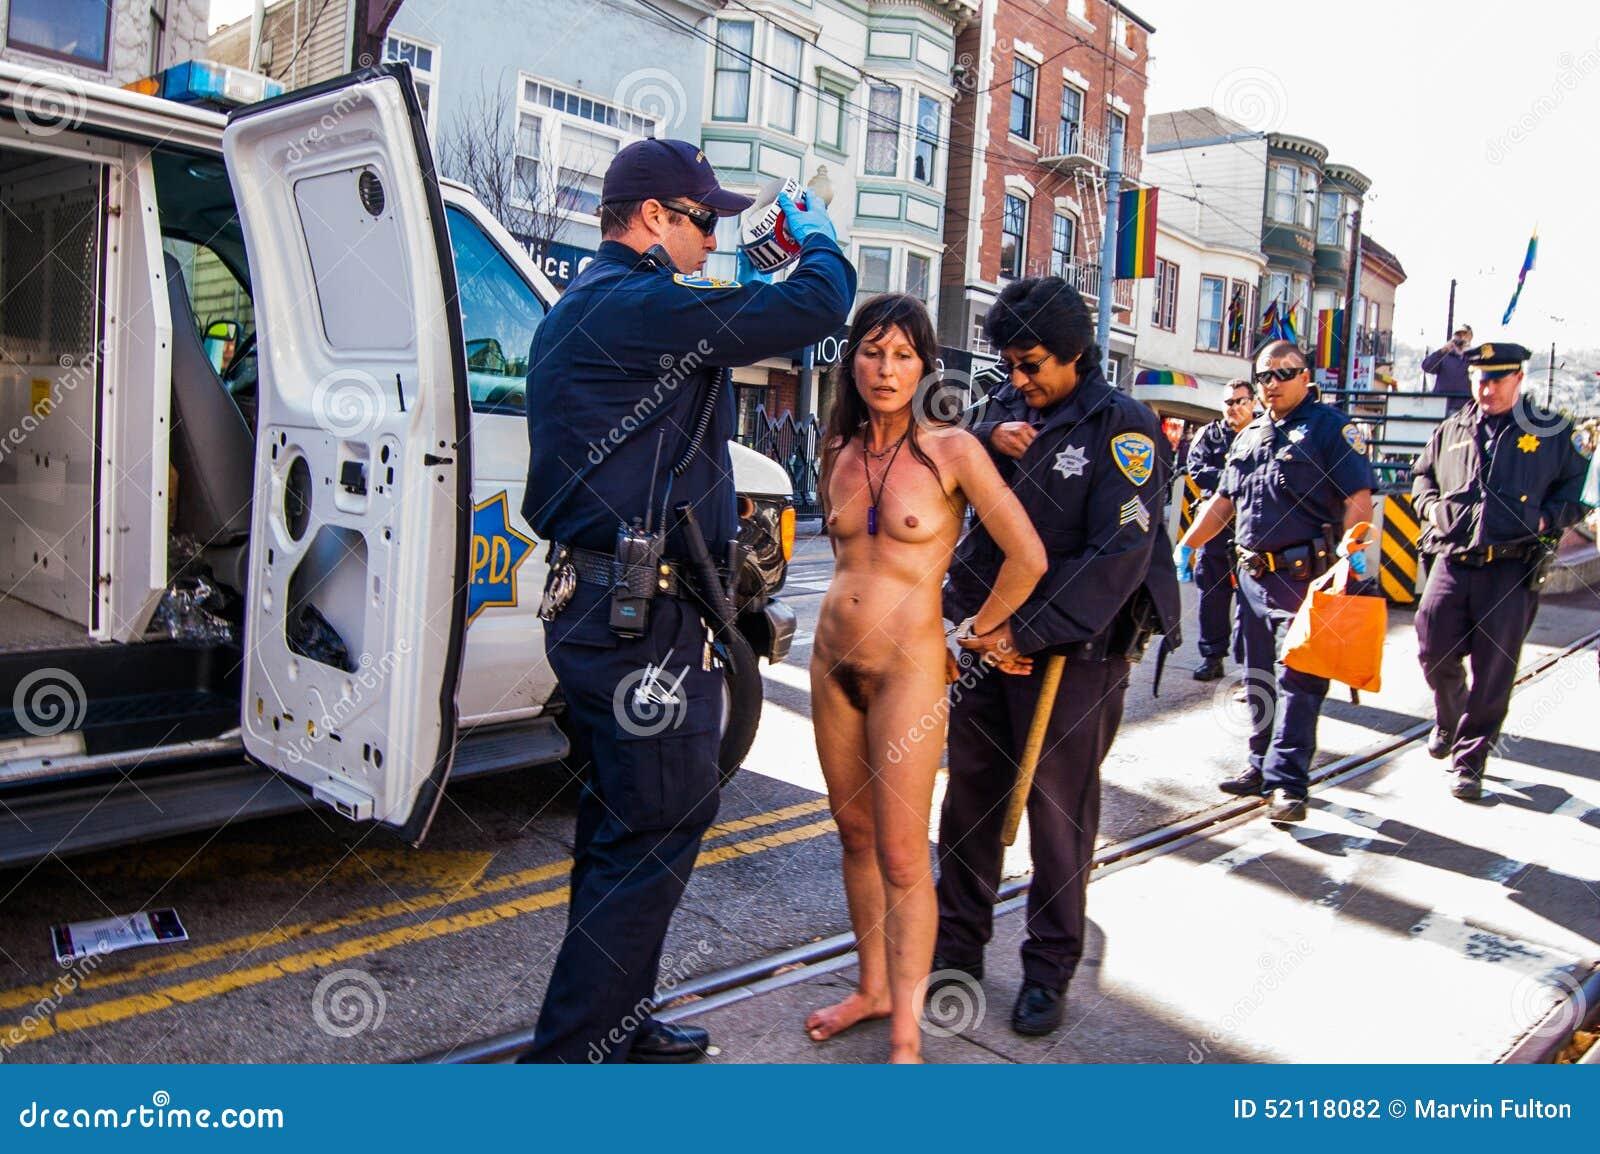 naked women san francisco